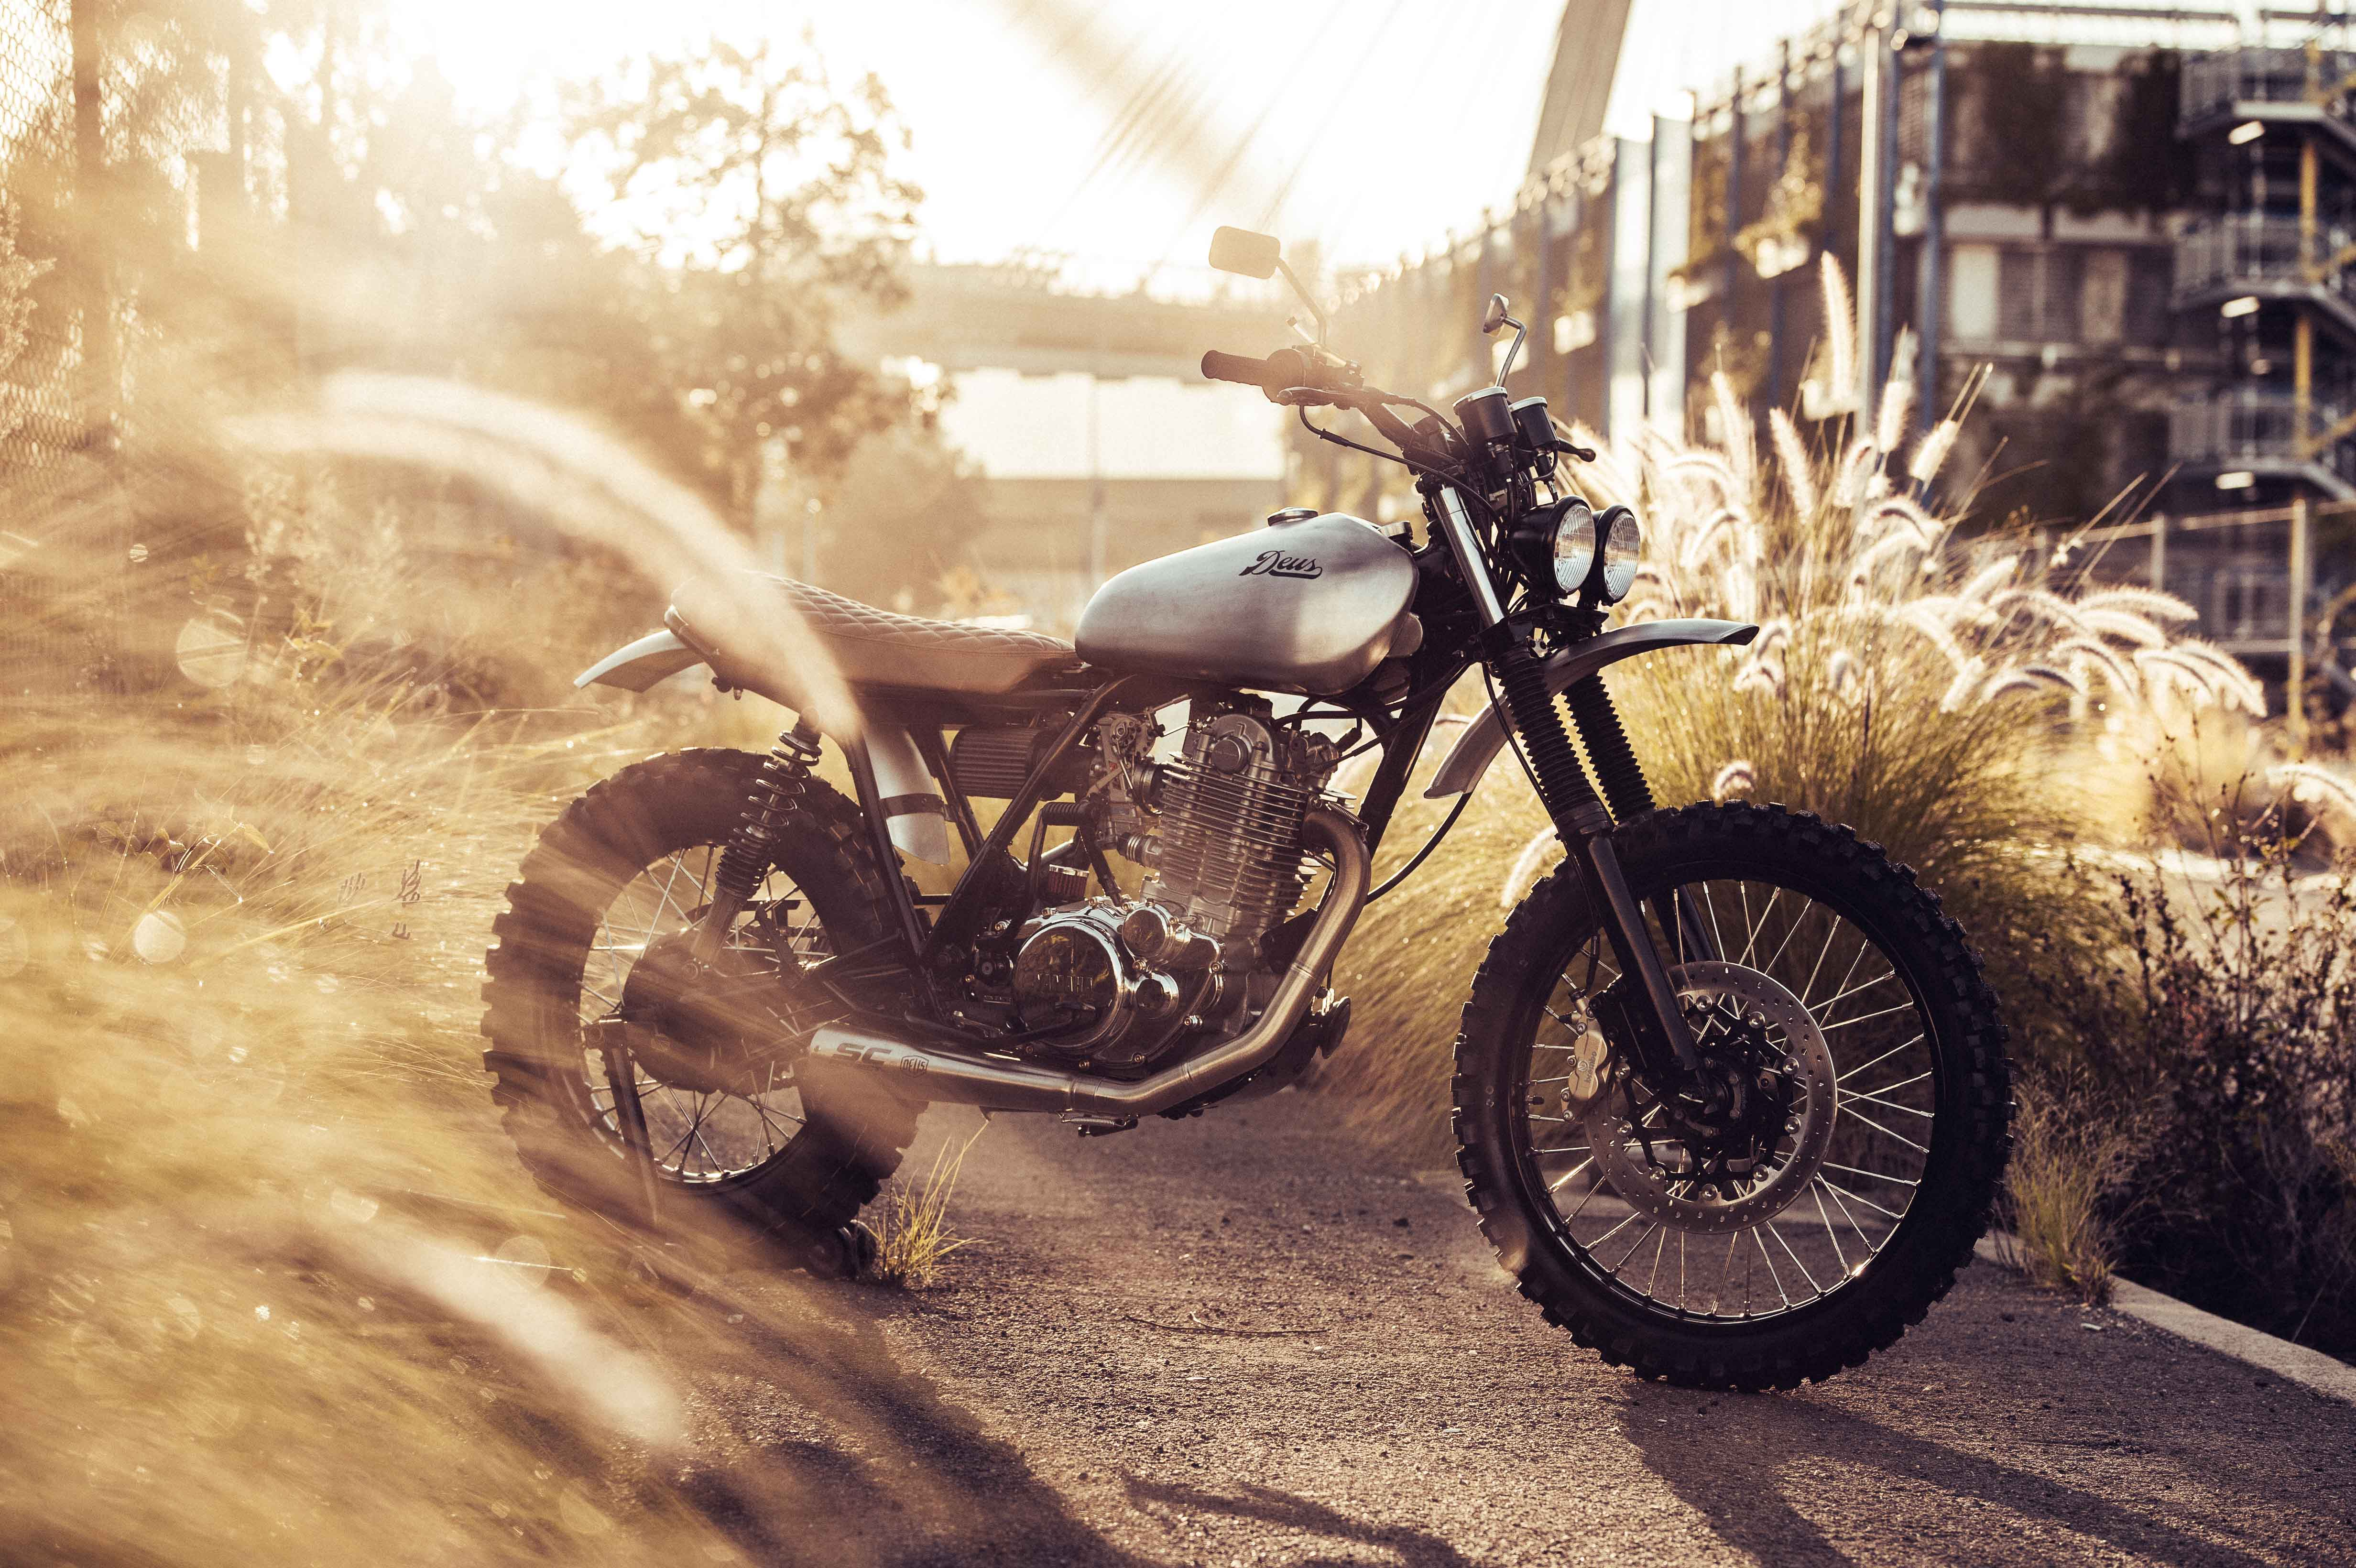 Deus SR500 custom bike